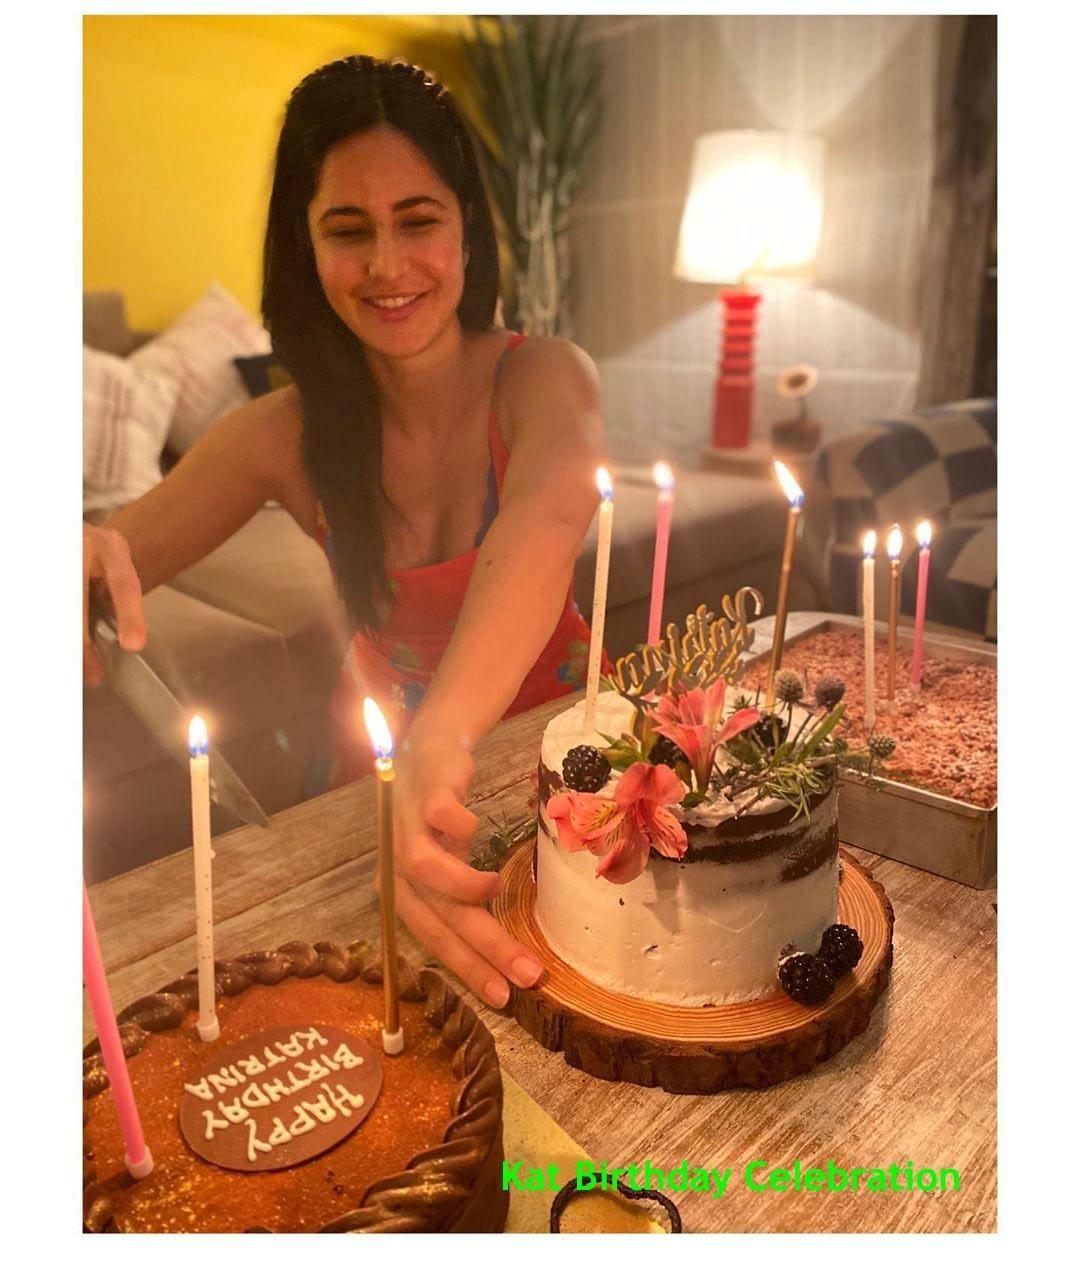 Kat celebrate her birthday